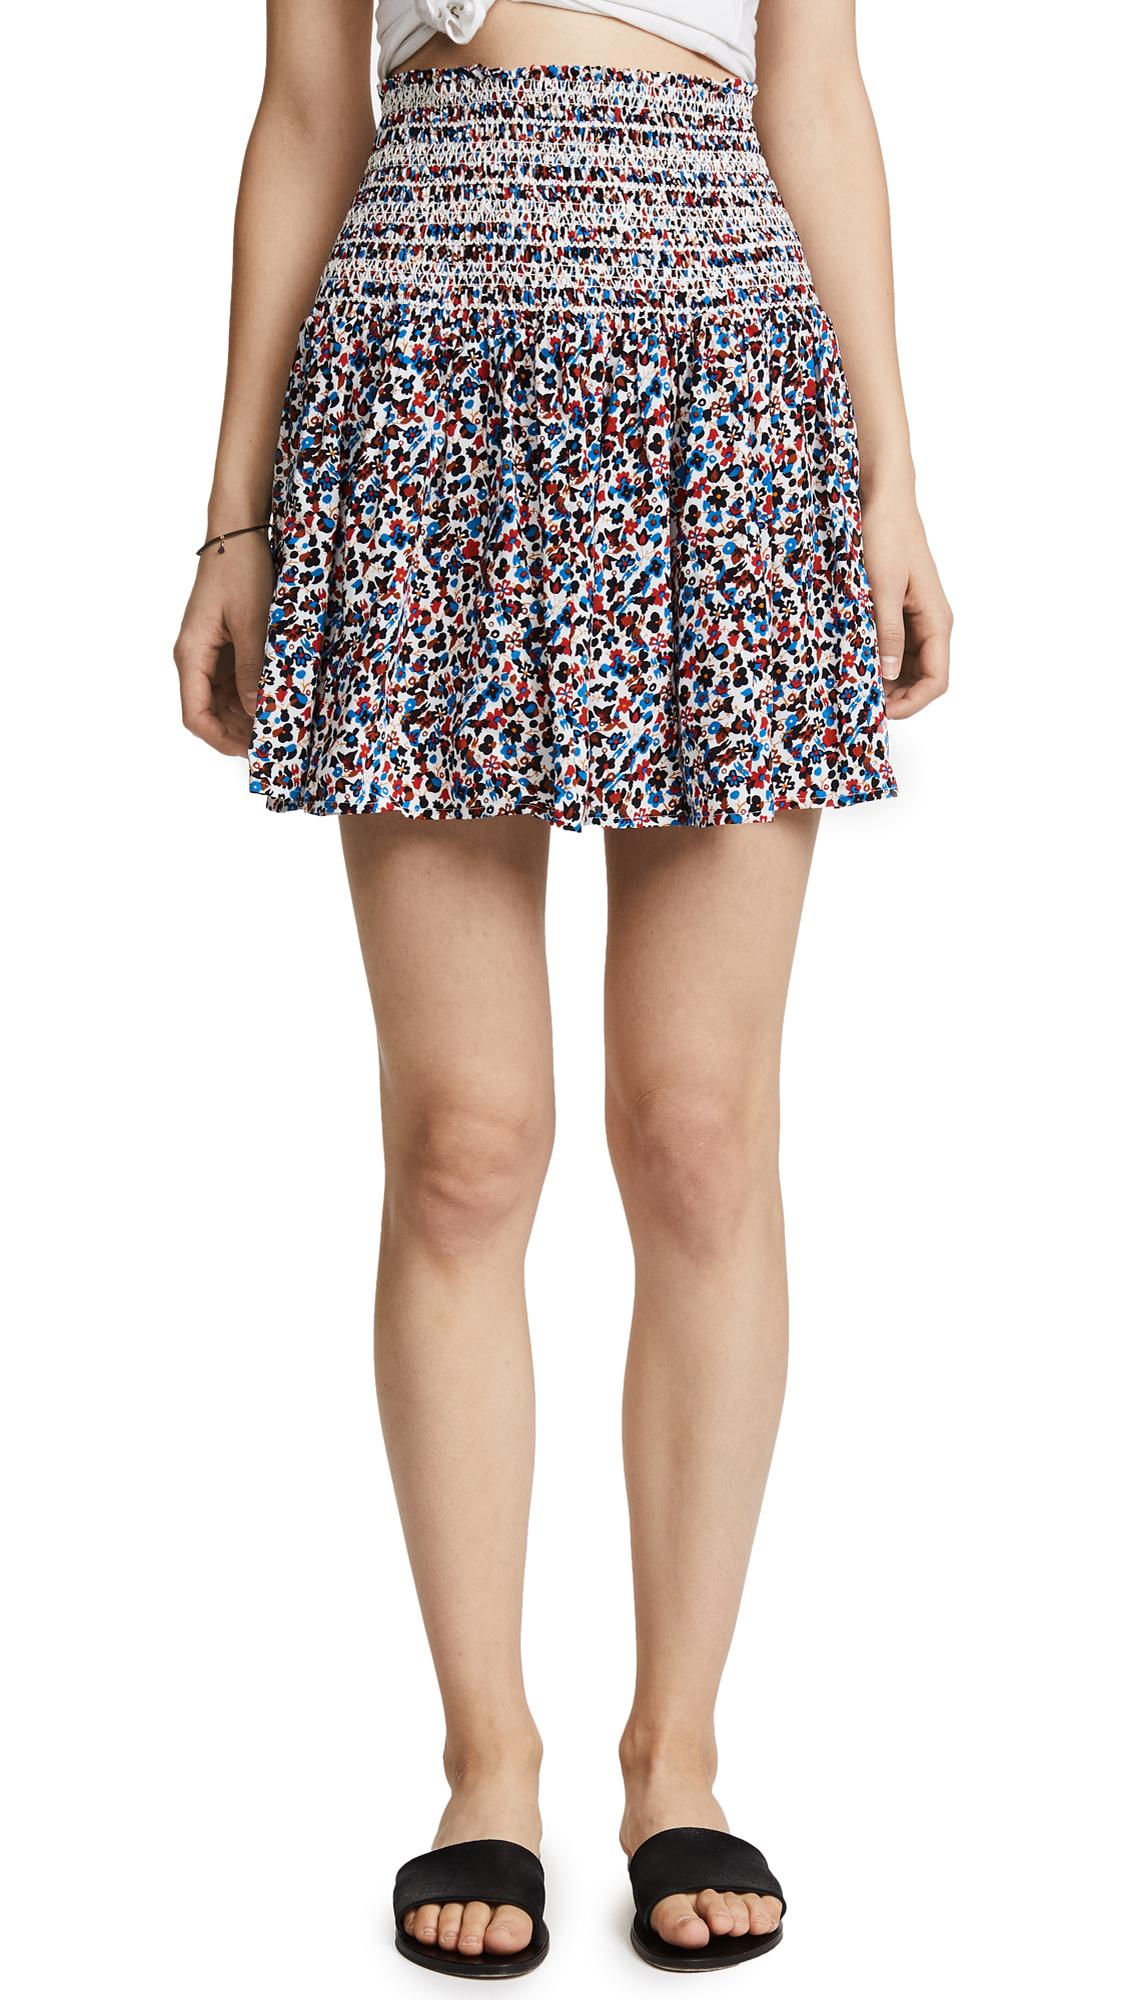 Tory Burch Wildflower Smocked Beach Skirt - Wildflower